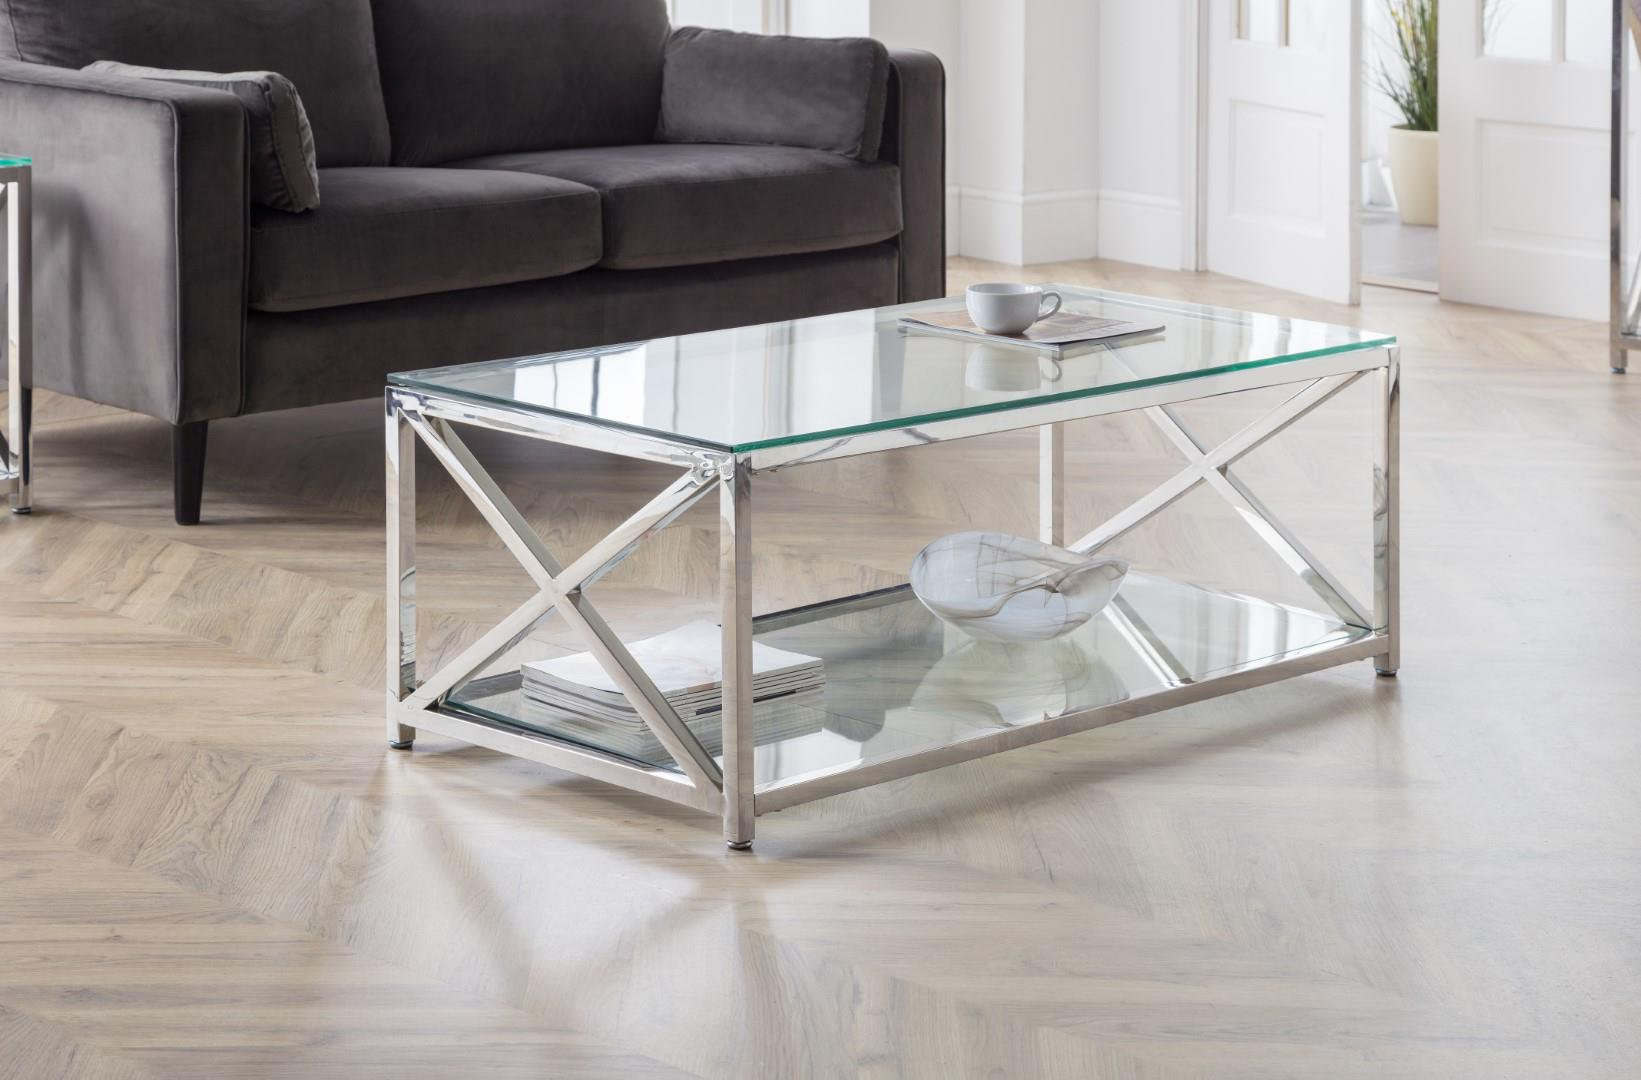 julian bowen miami rectangular coffee table chrome glass modern design